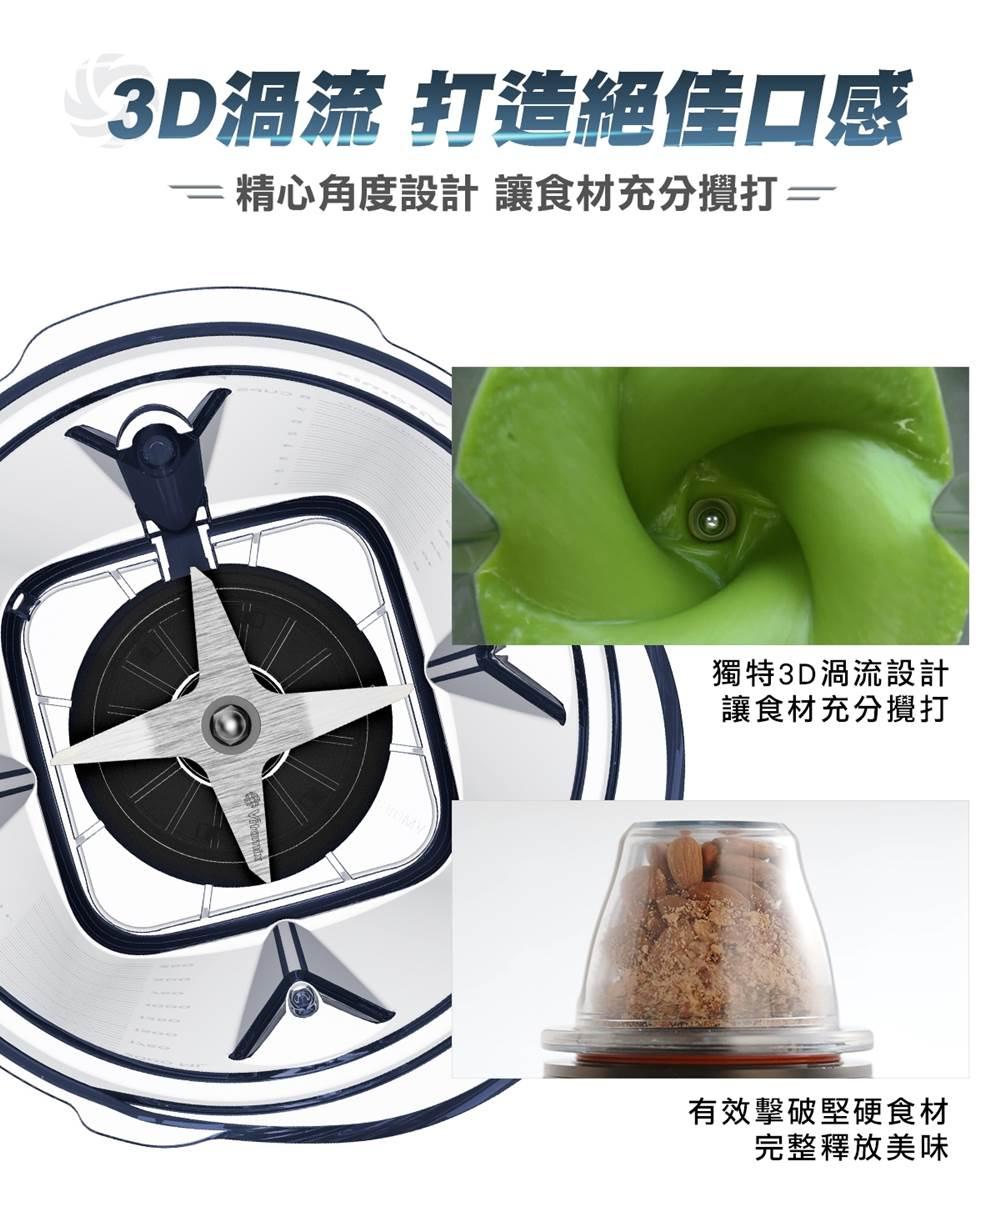 Vitamix-A2500i超跑級調理機-Ascent-3D渦流設計_高速擊碎